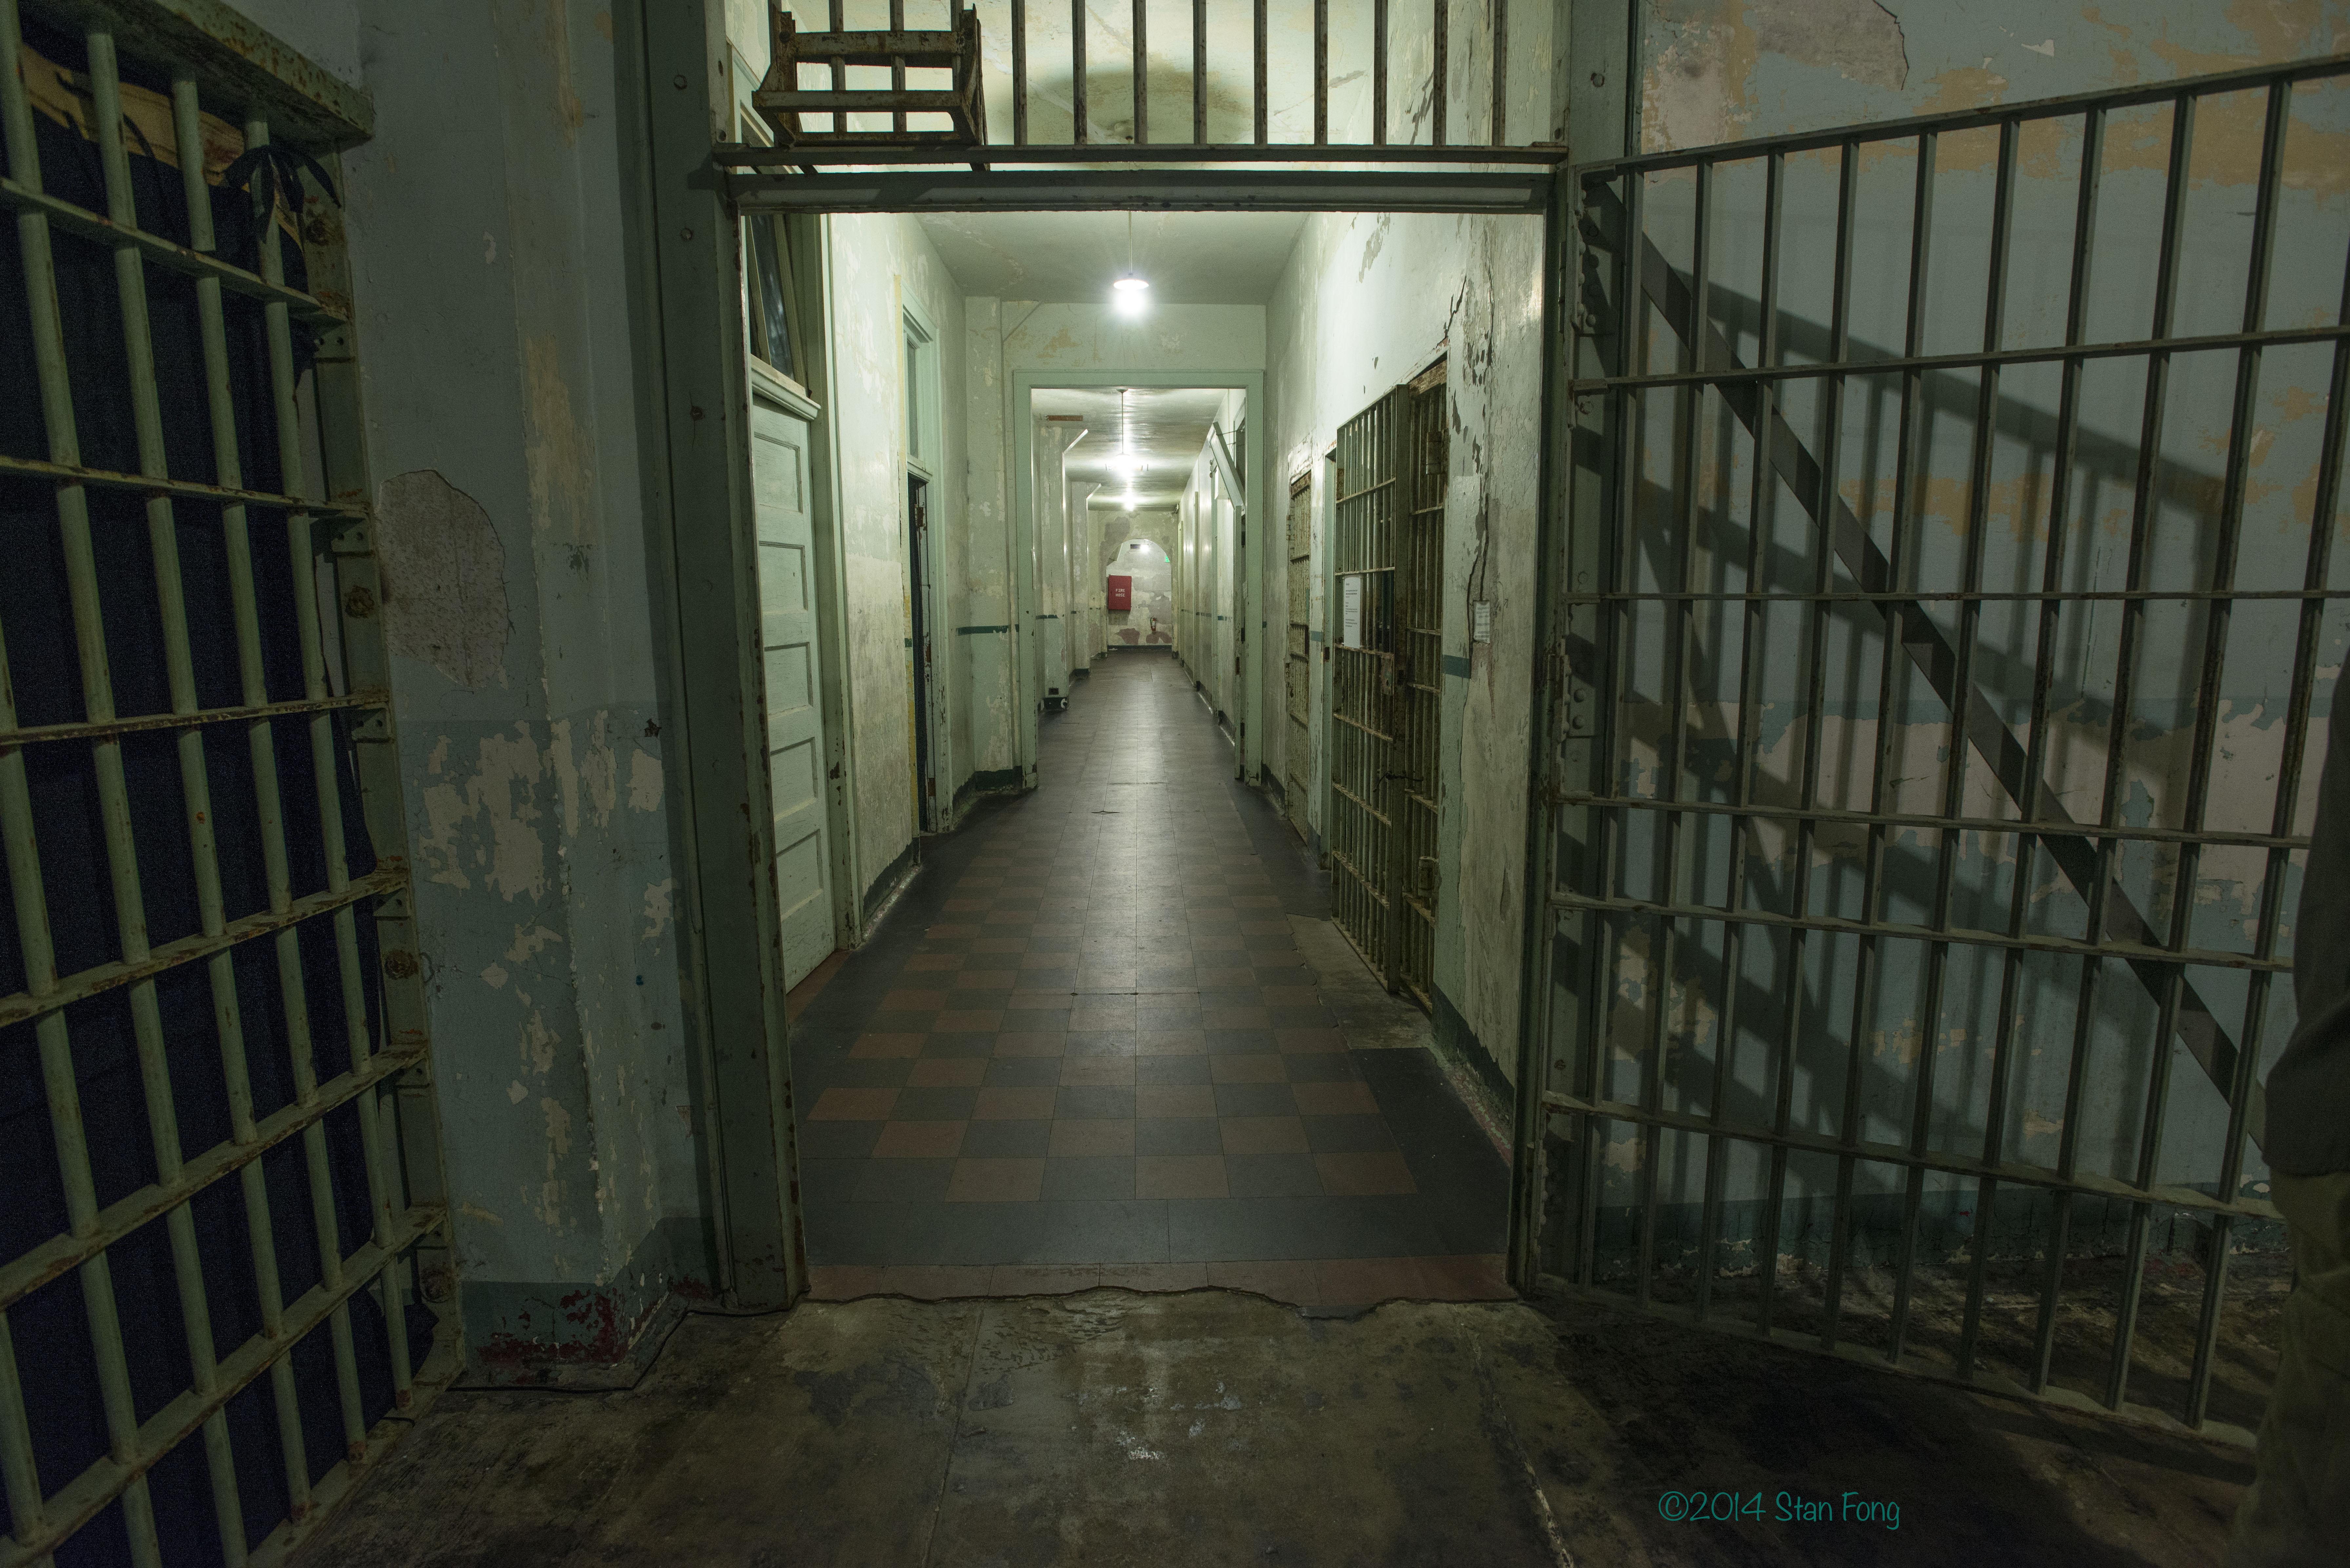 File:The Prison Hospital corridor.JPG - Wikimedia Commons